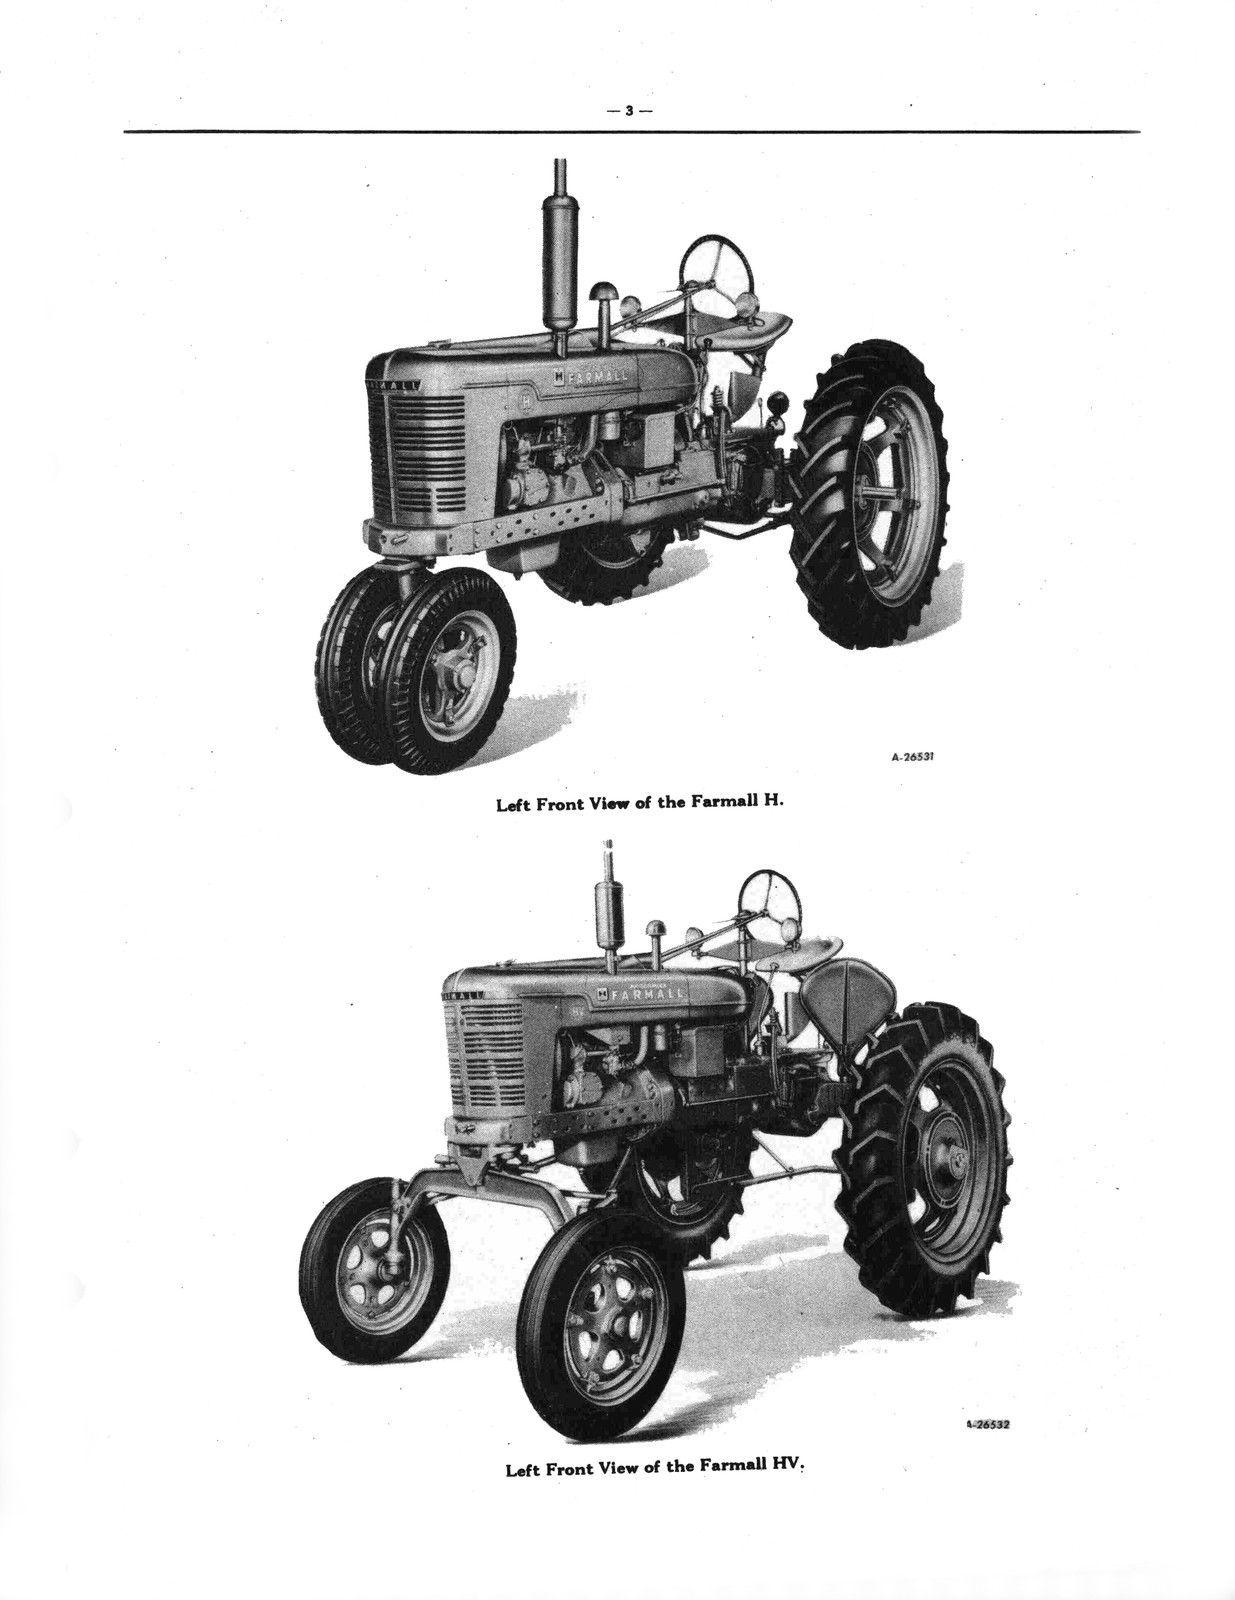 Farmall H Engine Part Diagram - Wiring Diagram & Schemas